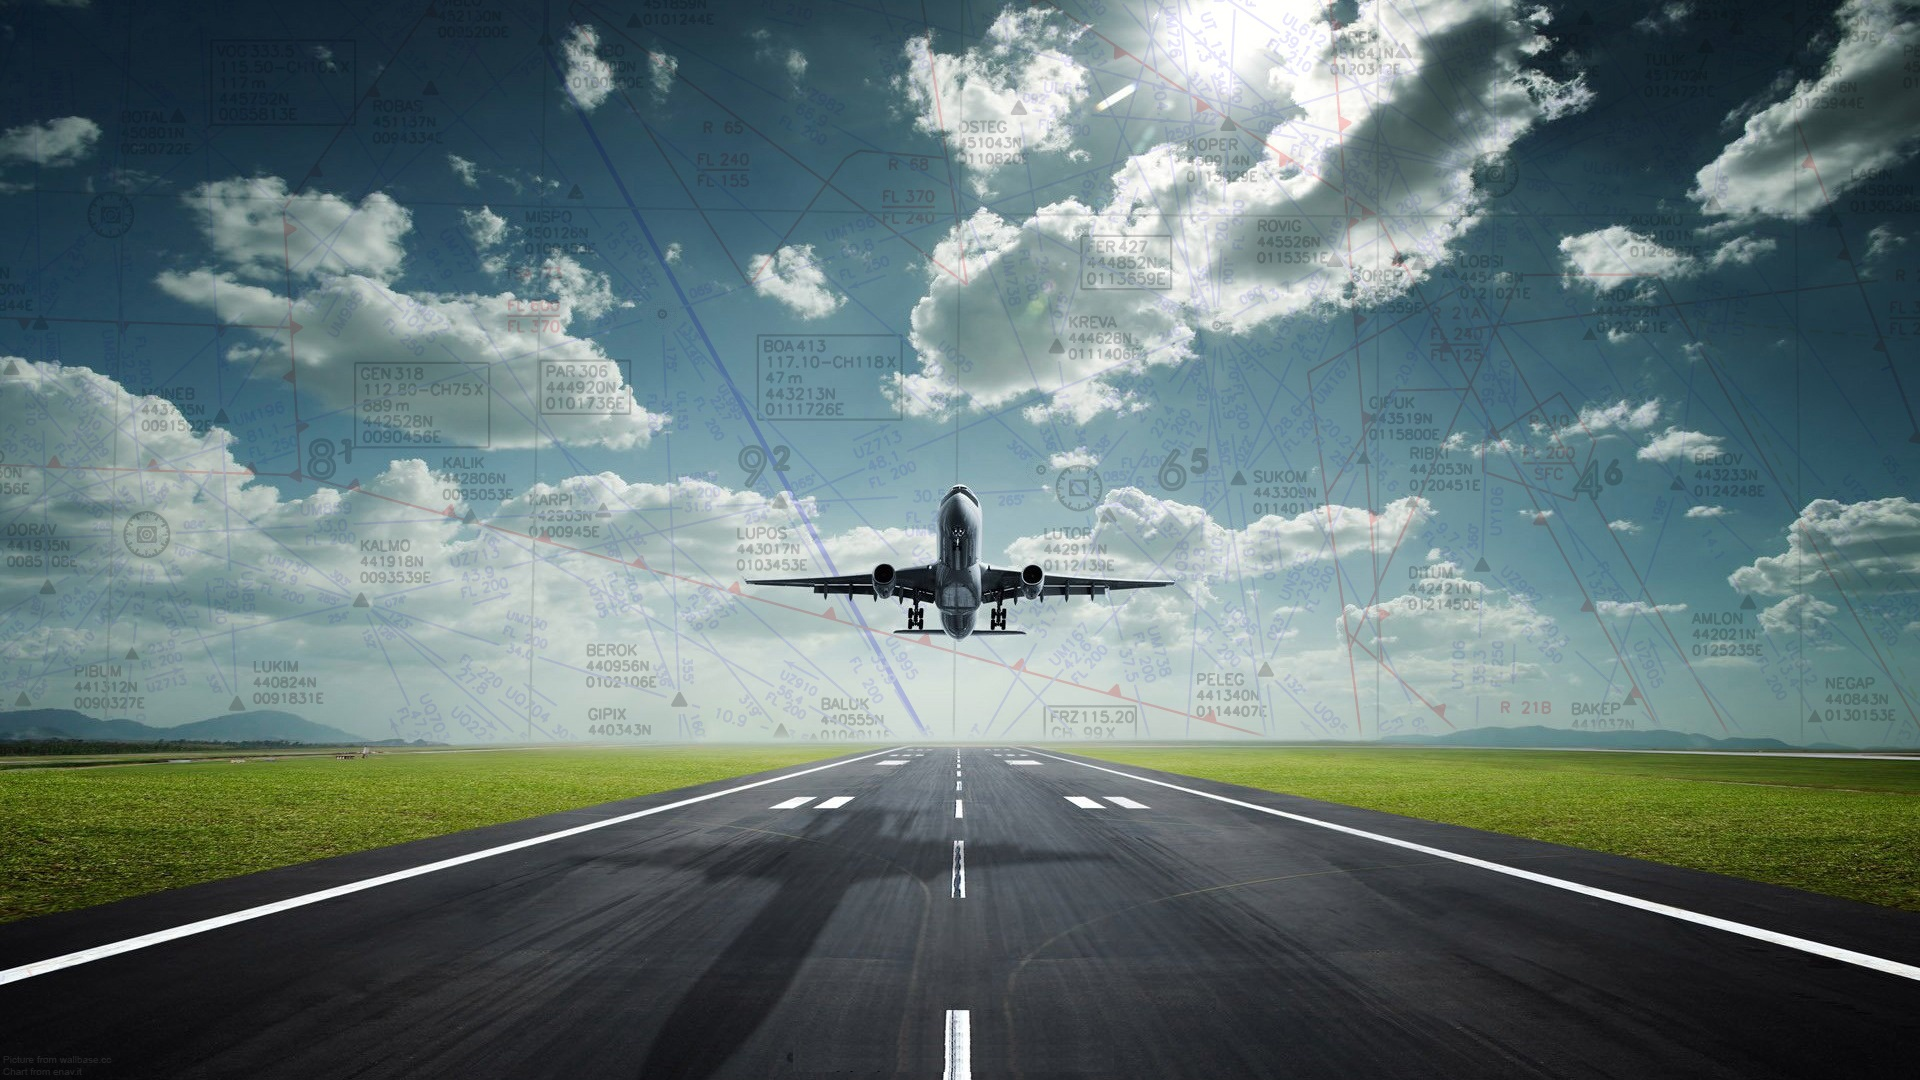 In Flight Backgrounds